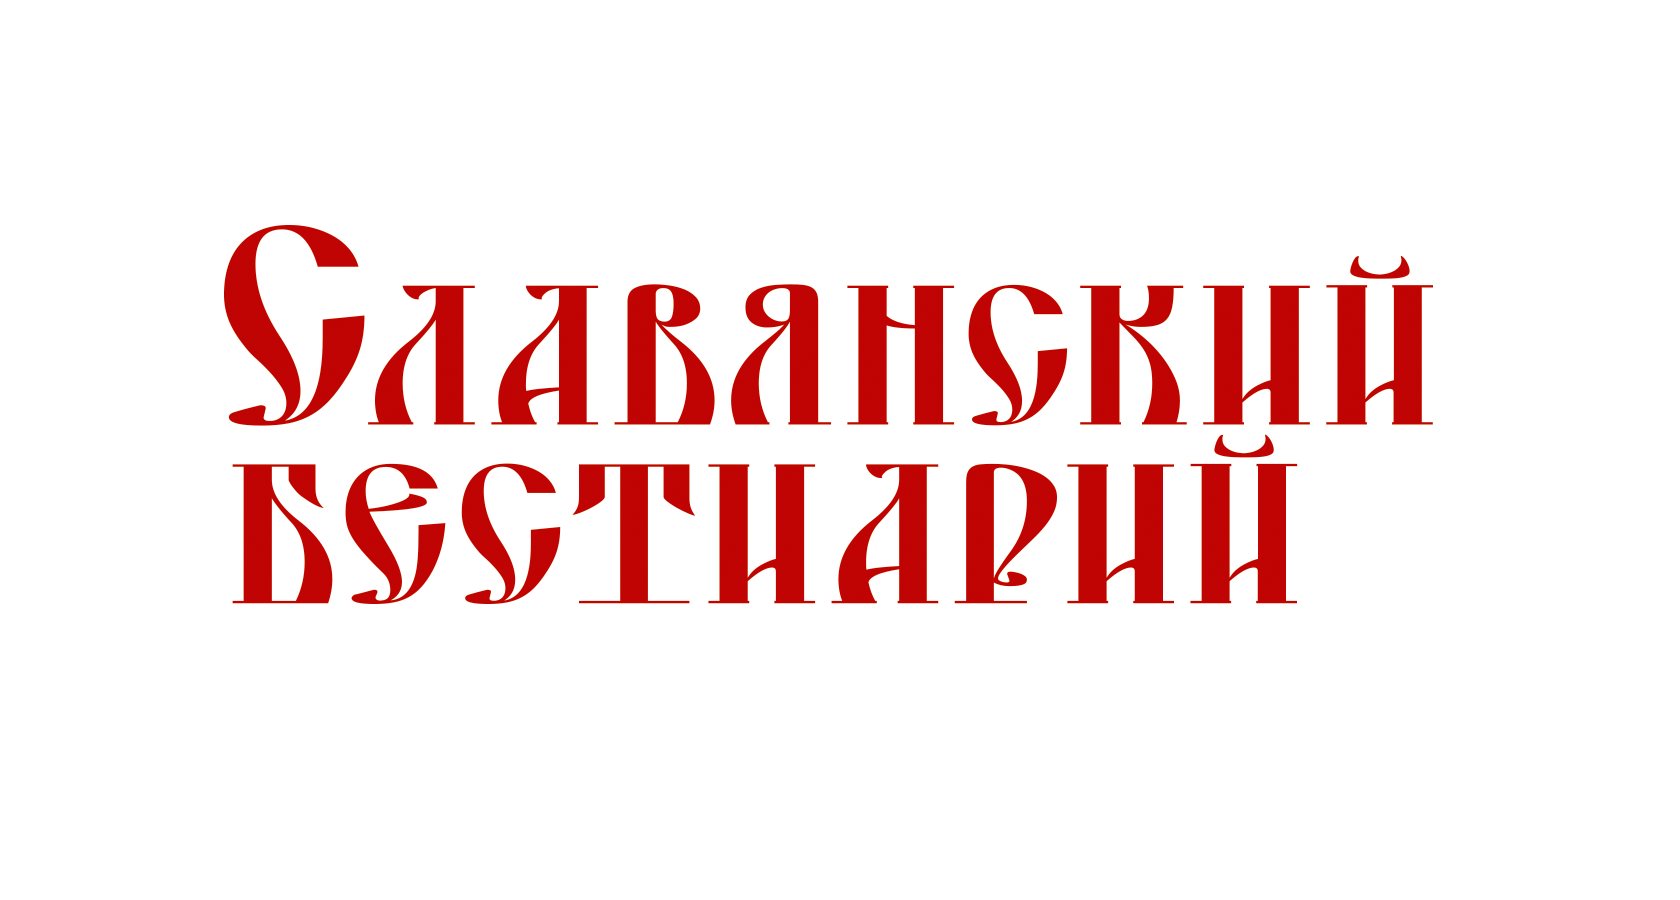 славянский бестиарий